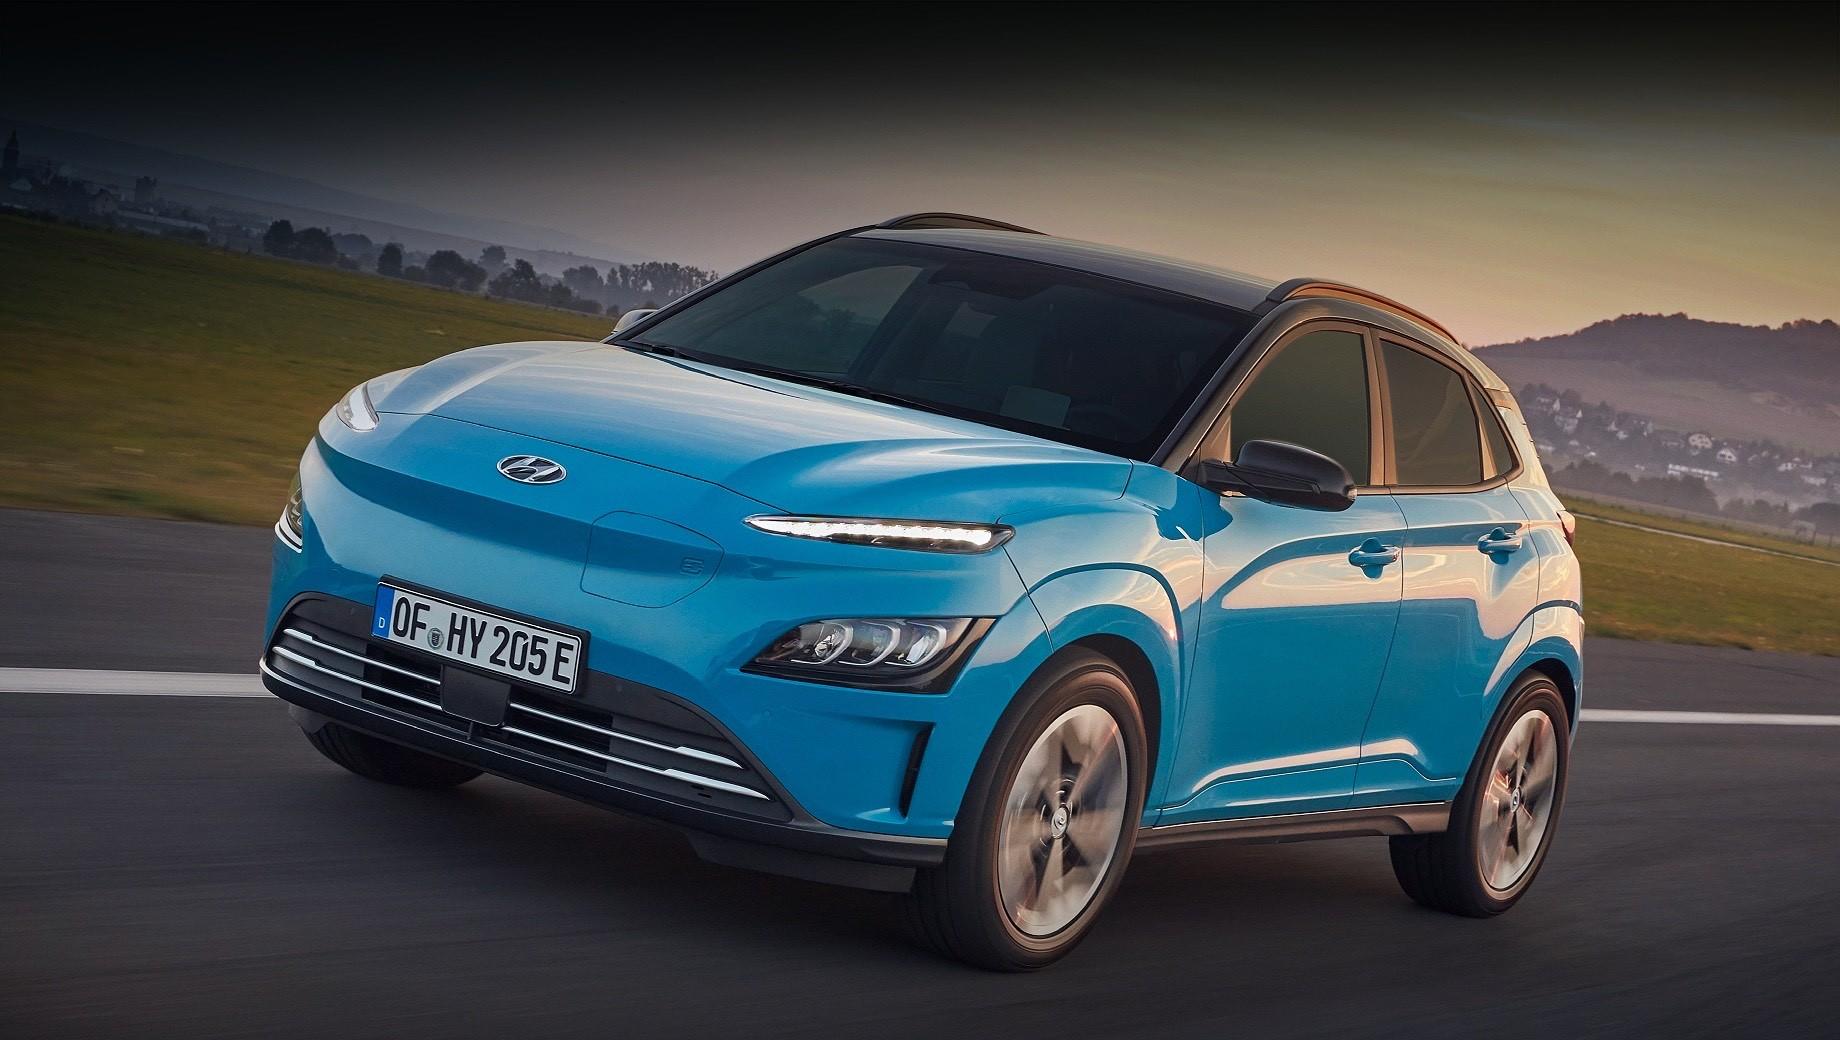 Кроссовер Hyundai Kona Electric заметно обновился снаружи и внутри